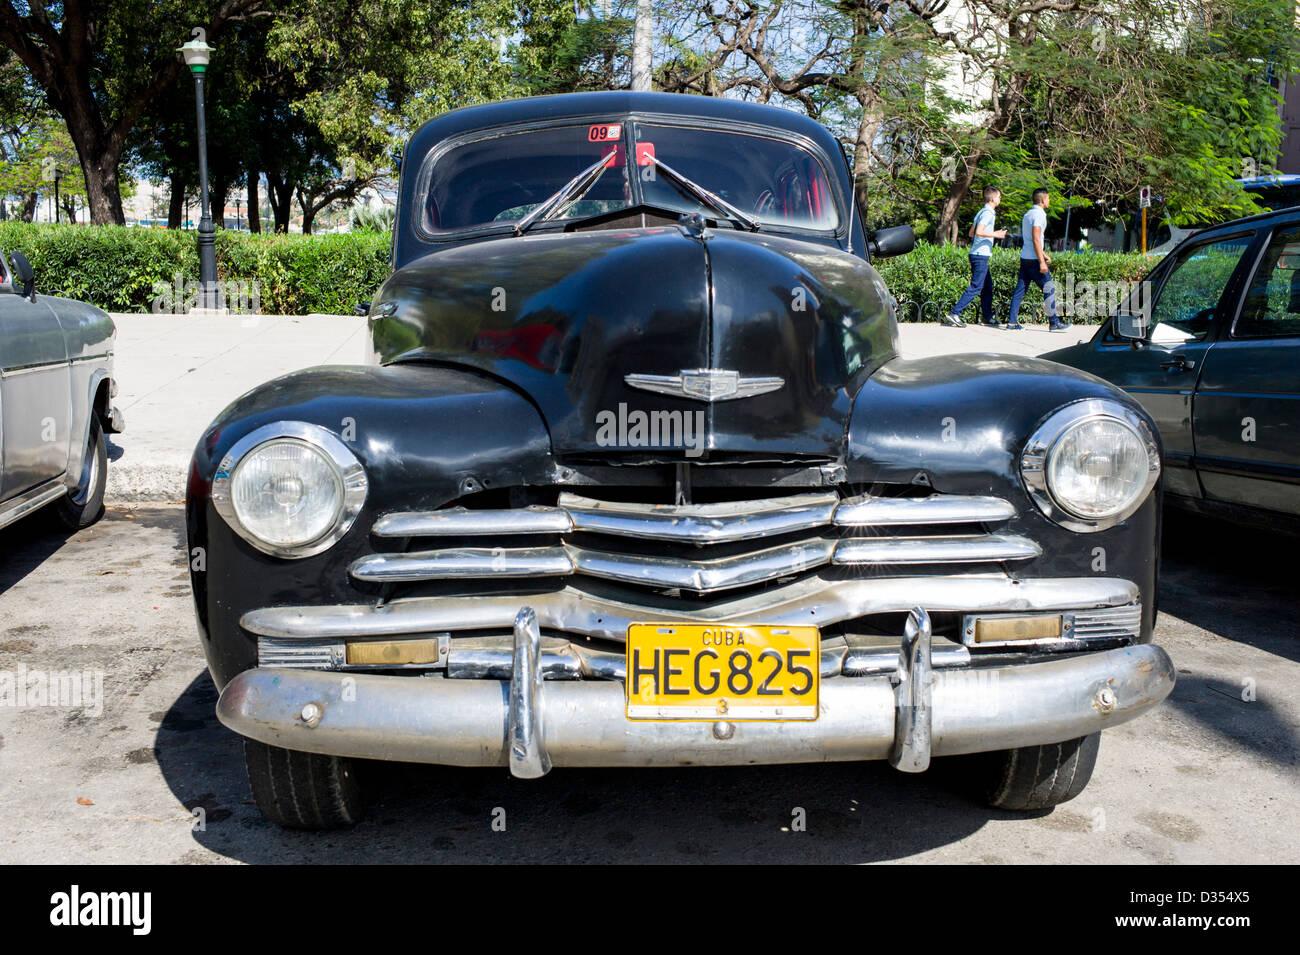 old 1950s cars havana cuba stockfotos old 1950s cars havana cuba bilder alamy. Black Bedroom Furniture Sets. Home Design Ideas